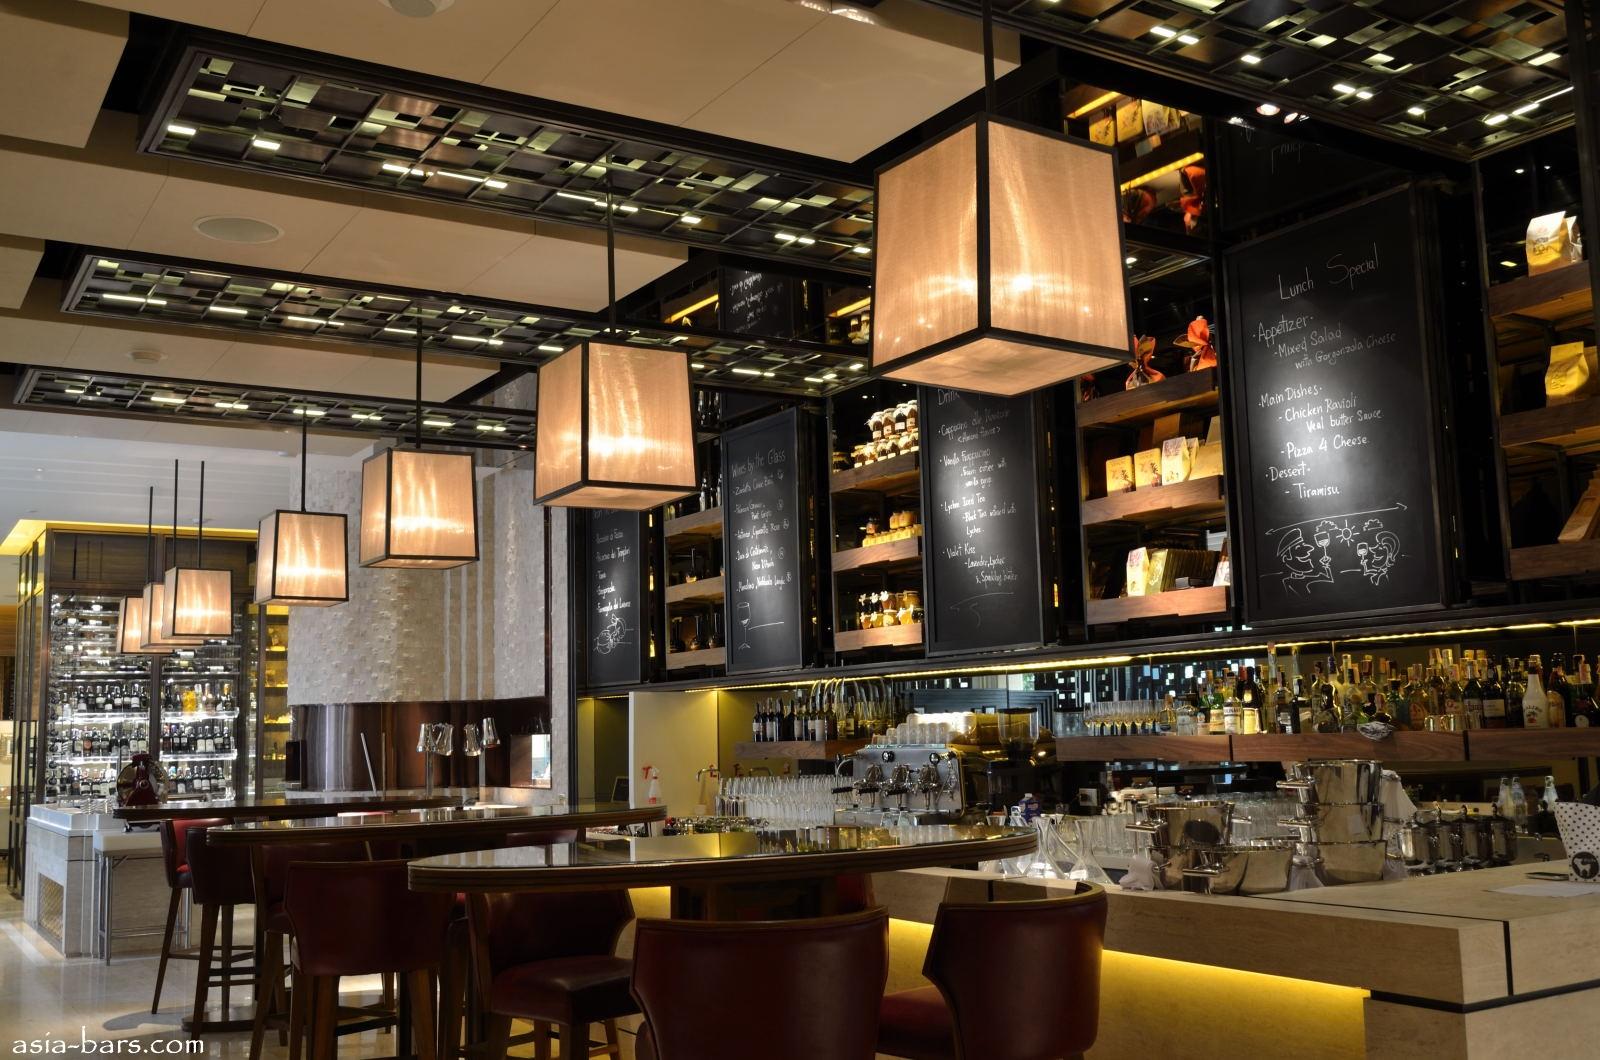 Jojo Lifestyle Italian Restaurant Amp Bar At The St Regis